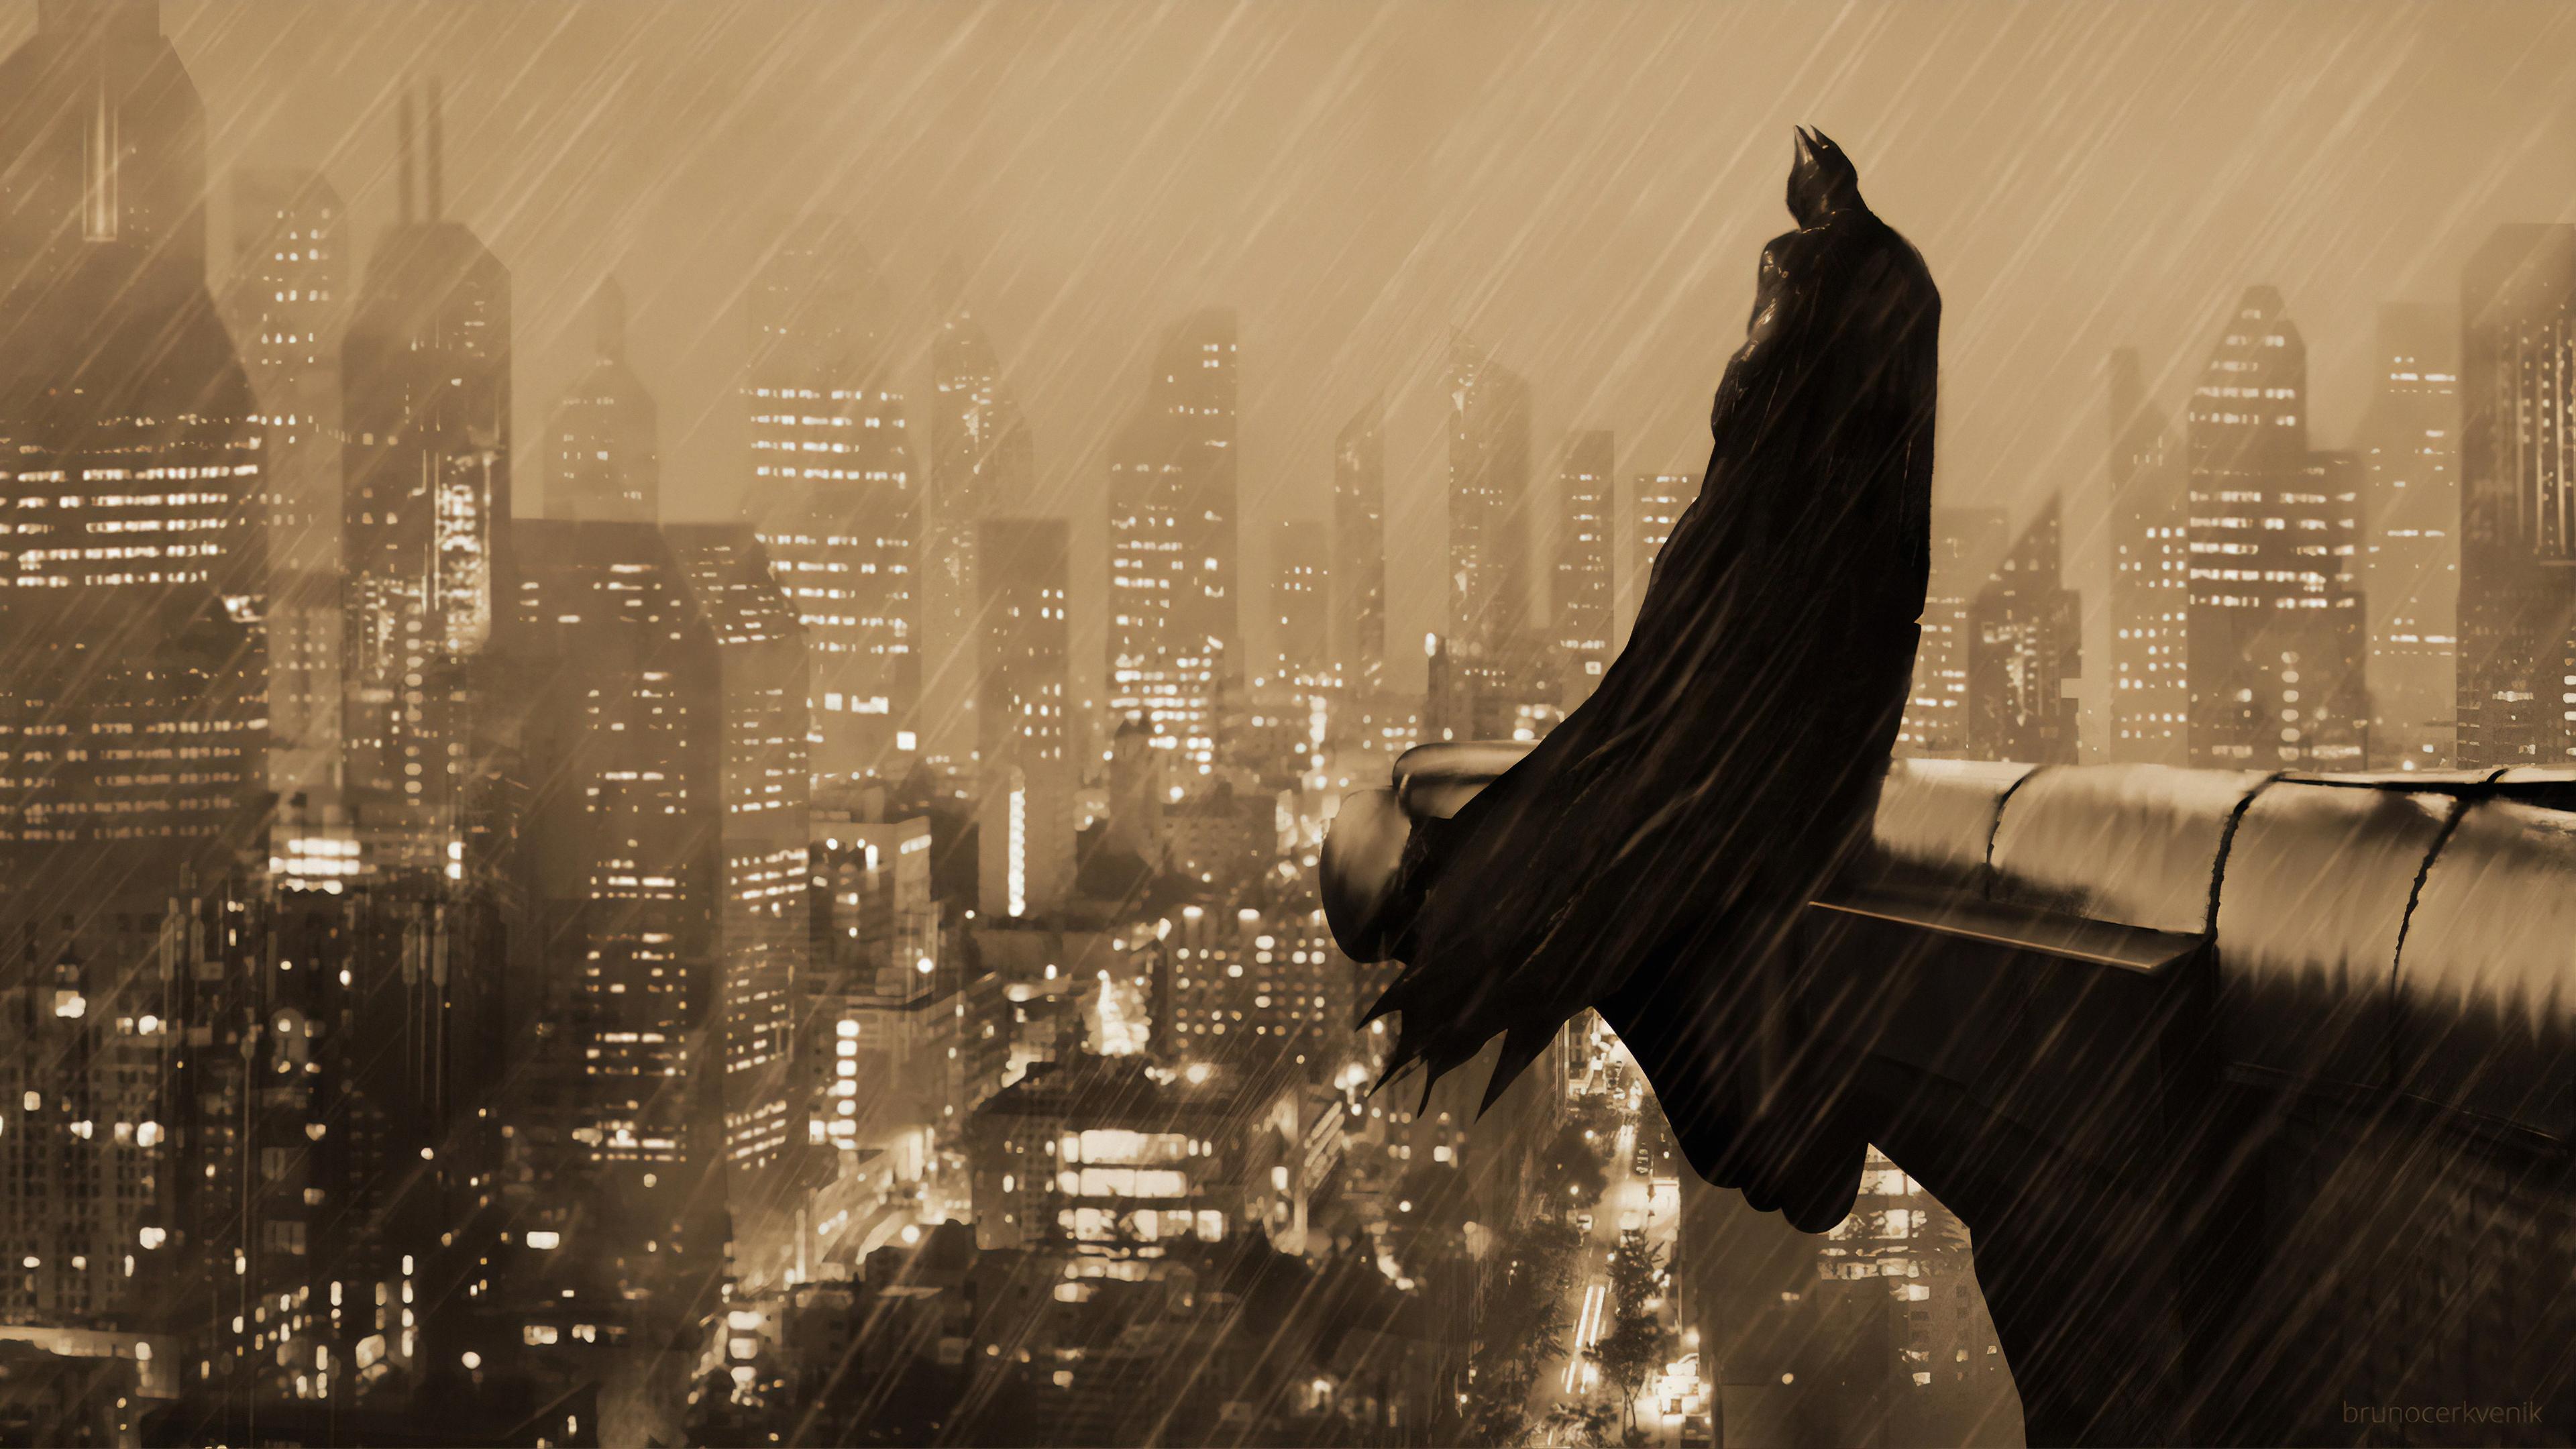 batman gotham art 1570394201 - Batman Gotham Art - superheroes wallpapers, hd-wallpapers, digital art wallpapers, batman wallpapers, artwork wallpapers, artstation wallpapers, 4k-wallpapers